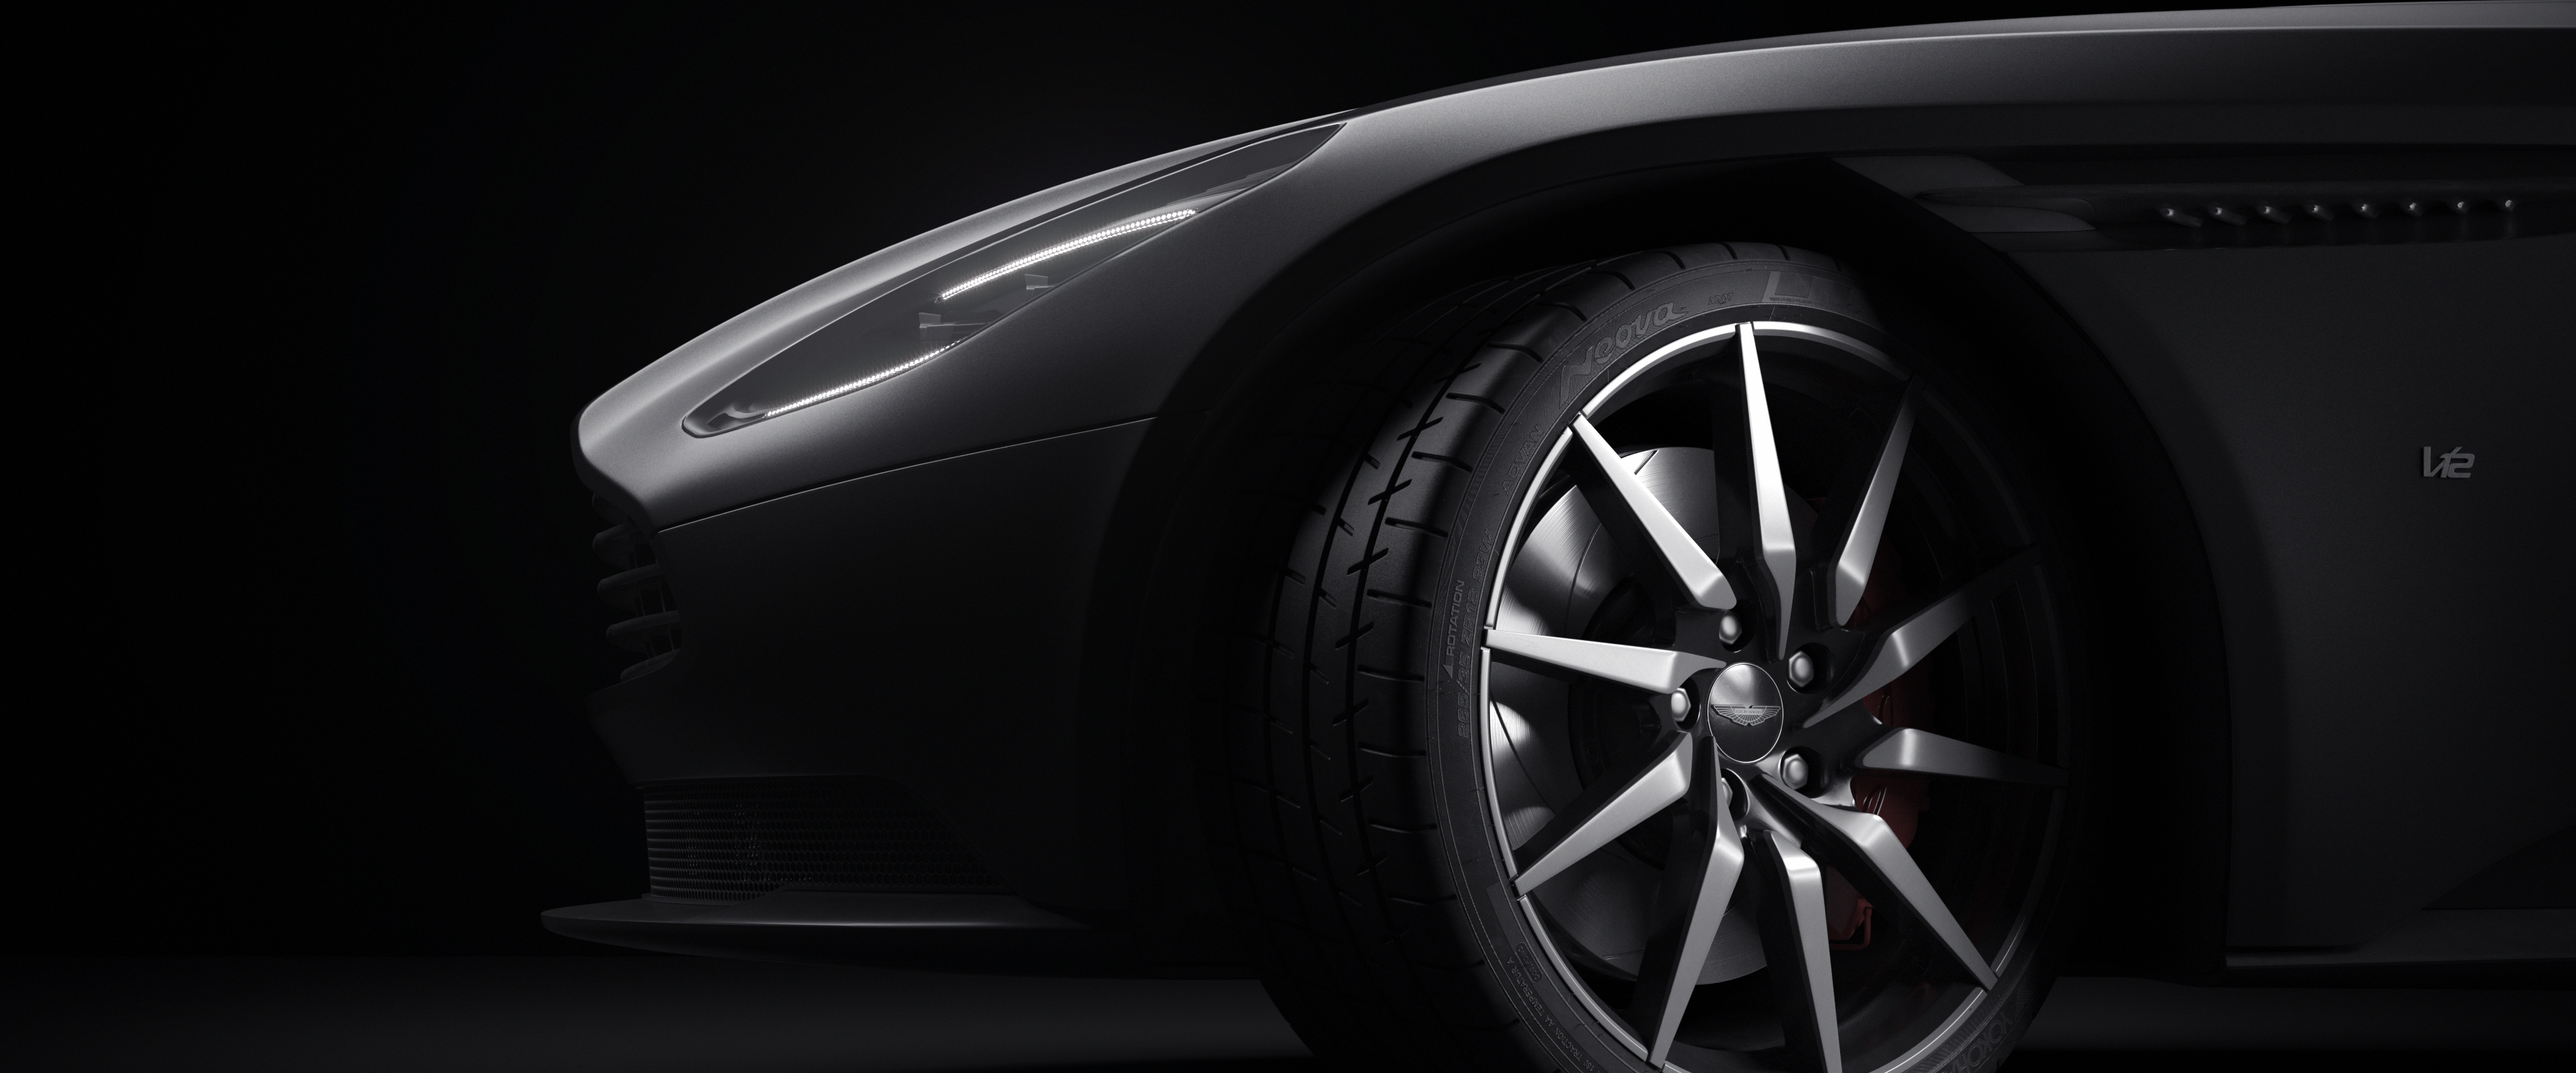 Aston Martin DB Headlights Inlifethrill Designs - Aston martin headlights